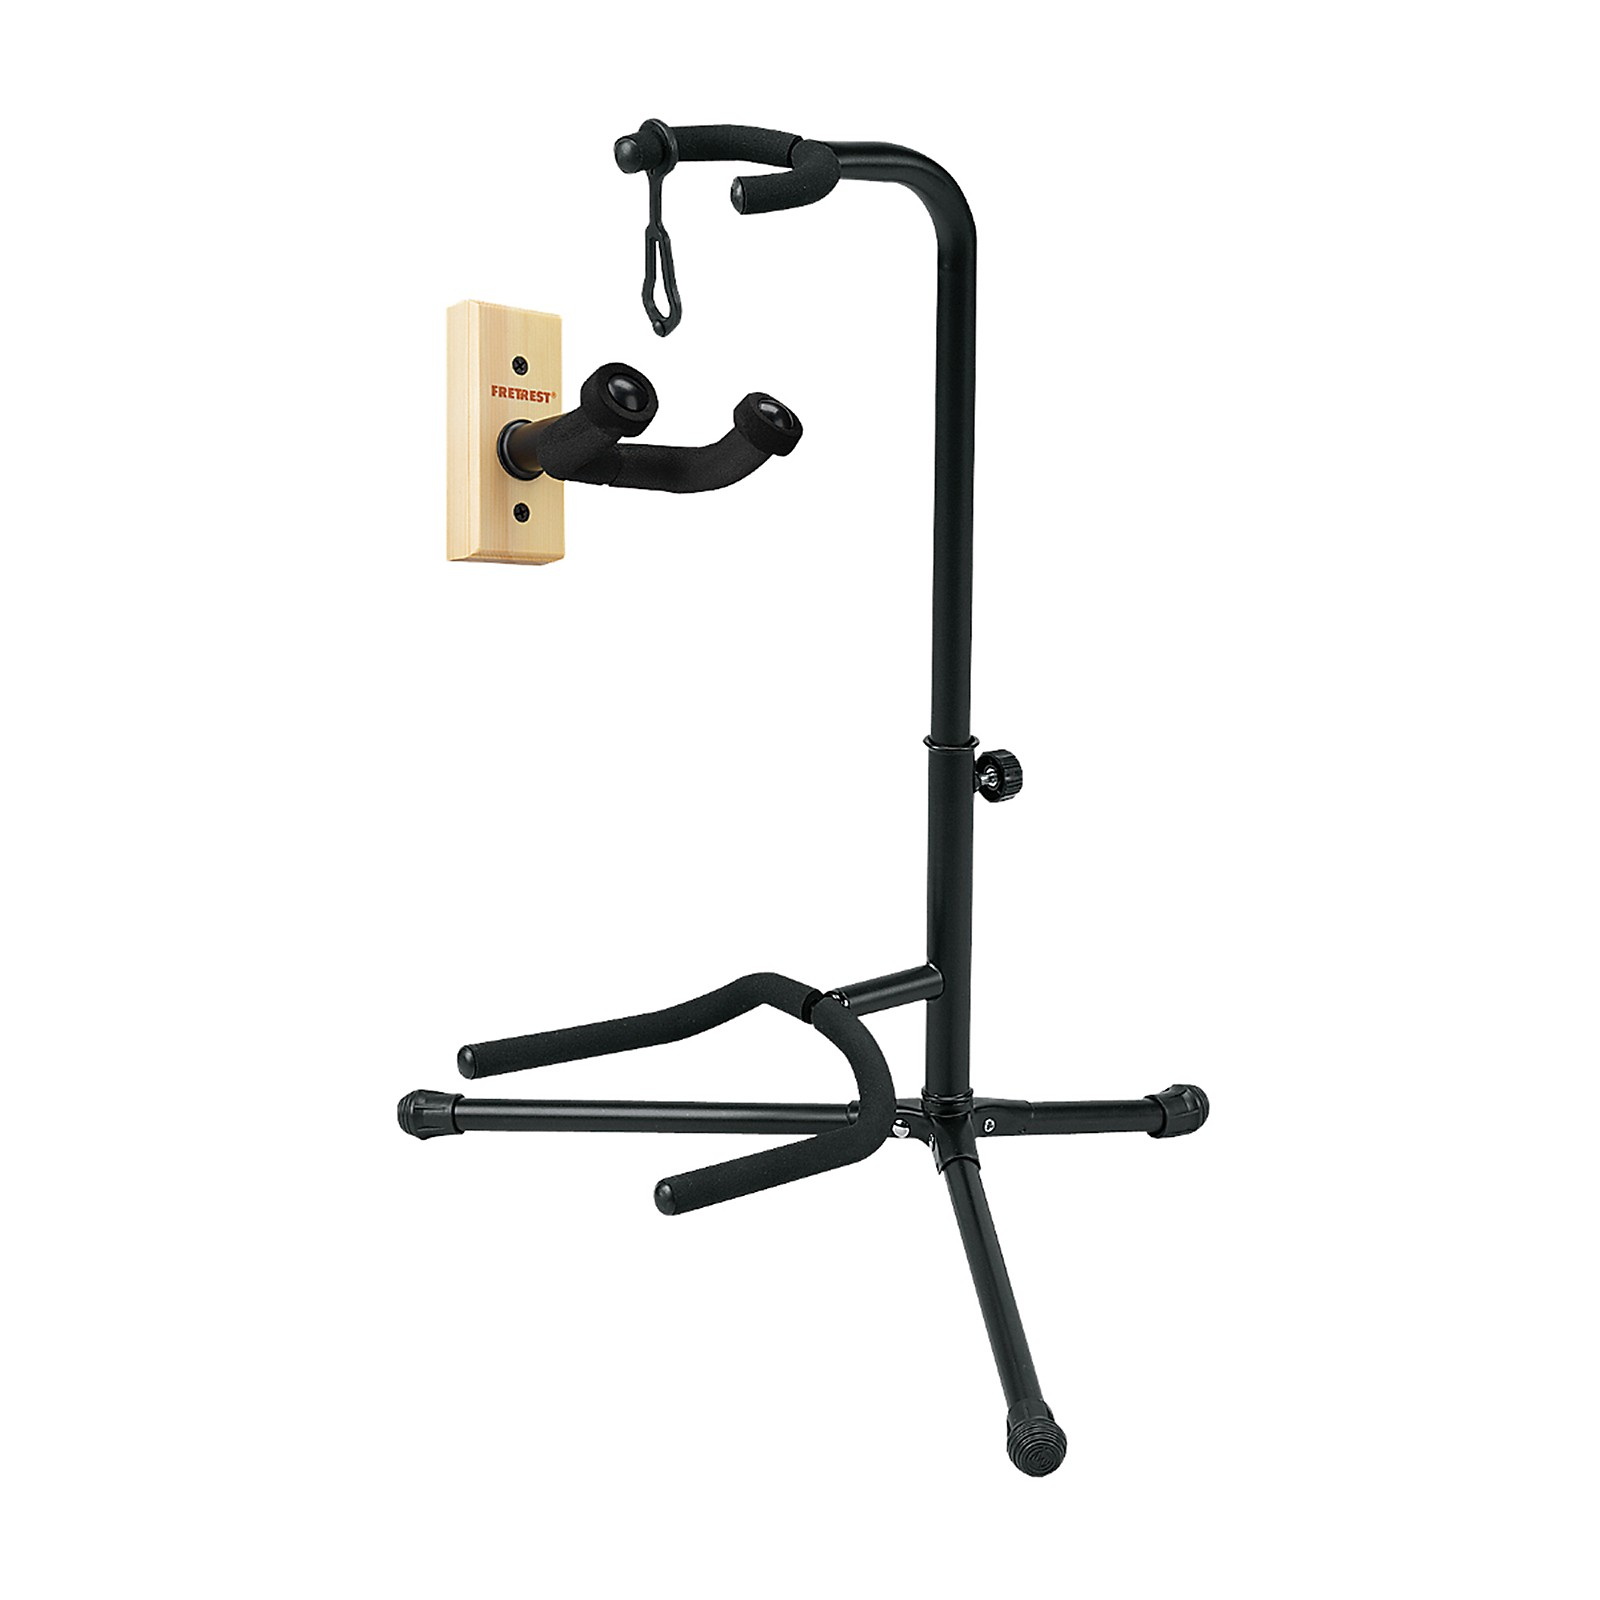 Musician's Gear GH1 Guitar Wall Hanger and SSG-303 Tubular Guitar Stand Package